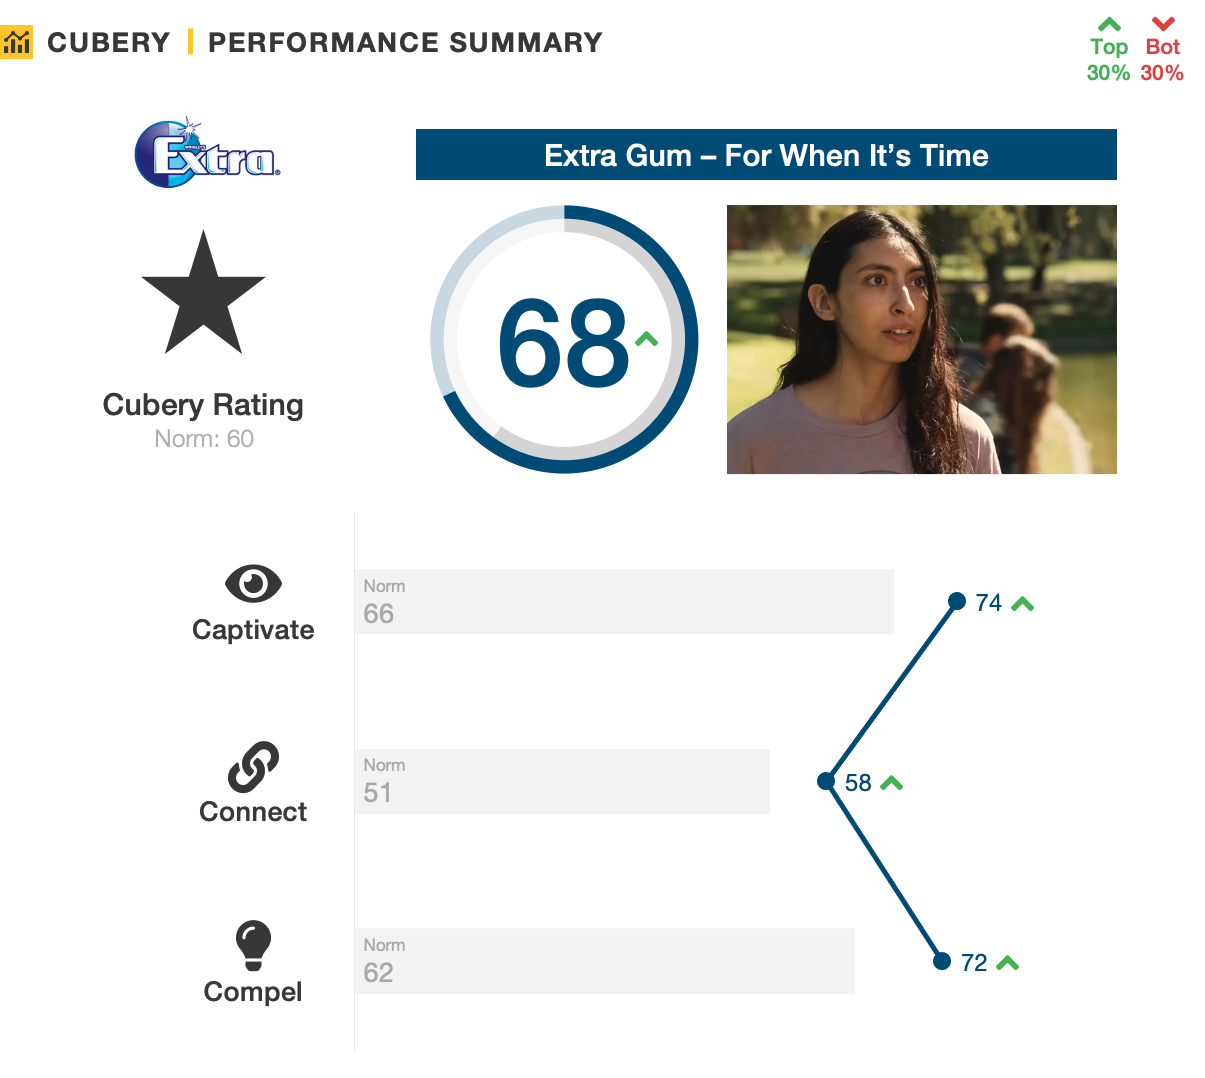 Wrigley's Extra - Ad Testing Post-Covid Lockdown - Performance Summary